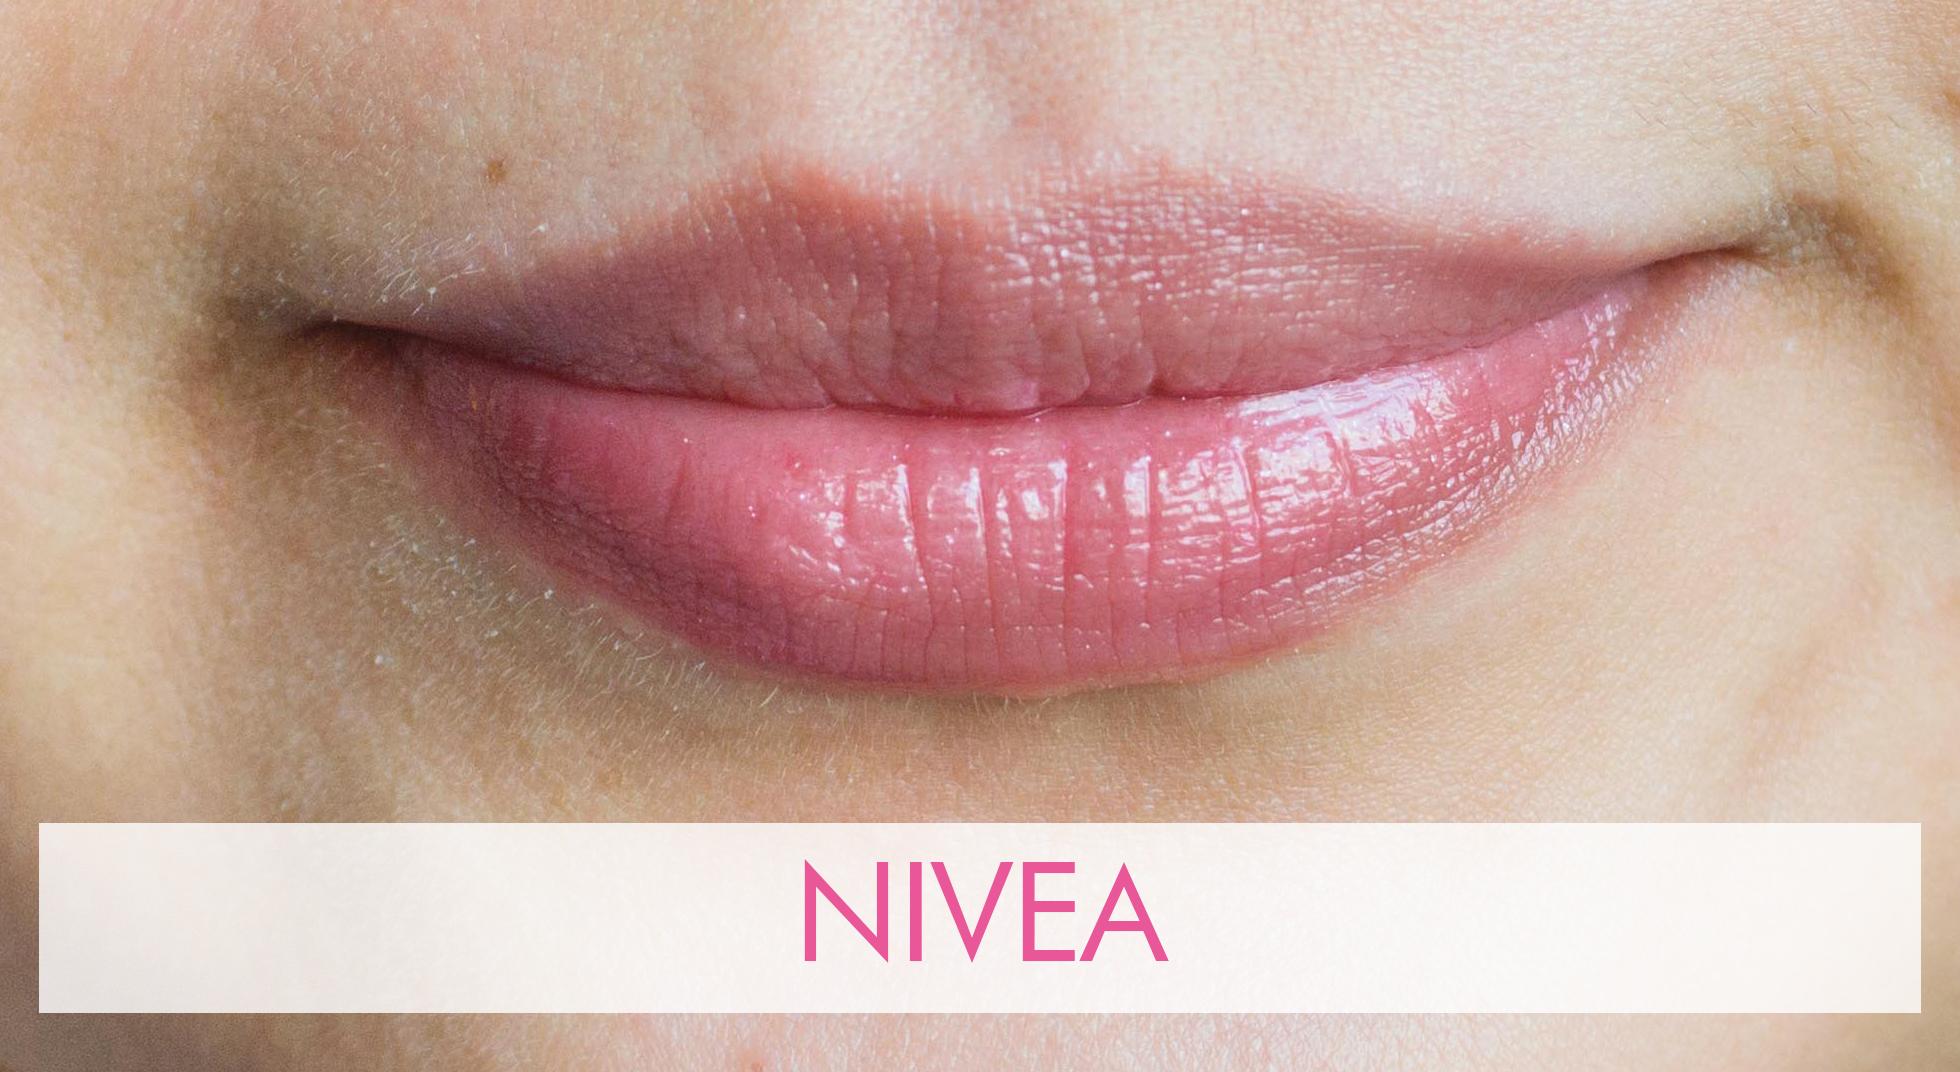 NIVEA_tinted-lip-balms_nivea-revlon-burts-bees-canmake-make-up-for-ever-happy-skin-lip-ice-k-palette-bobbi-brown_review-philippines_2019.jpg